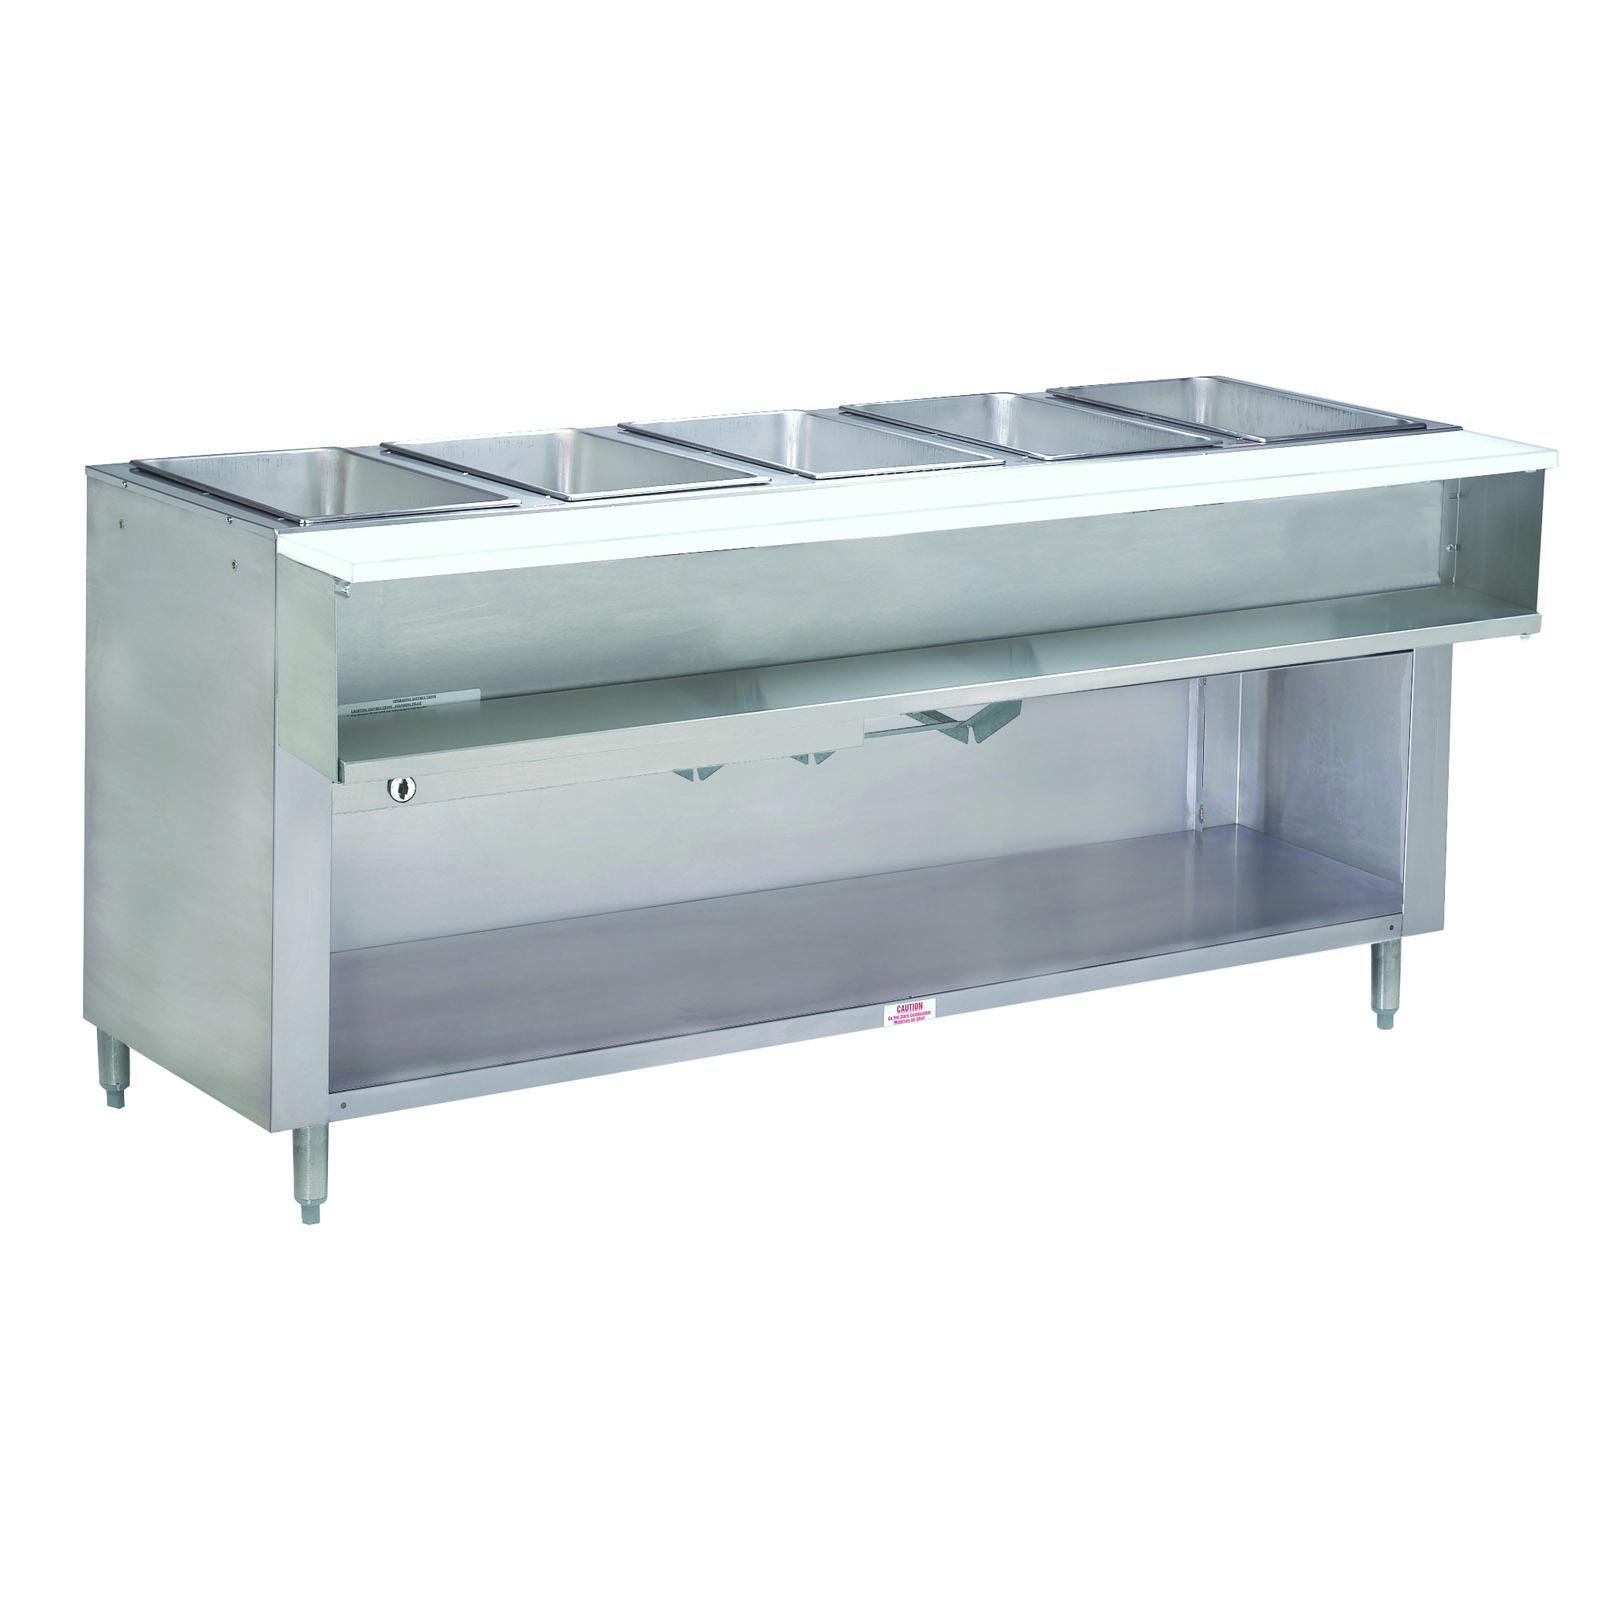 Advance Tabco WB-5G-NAT-BS serving counter, hot food, gas